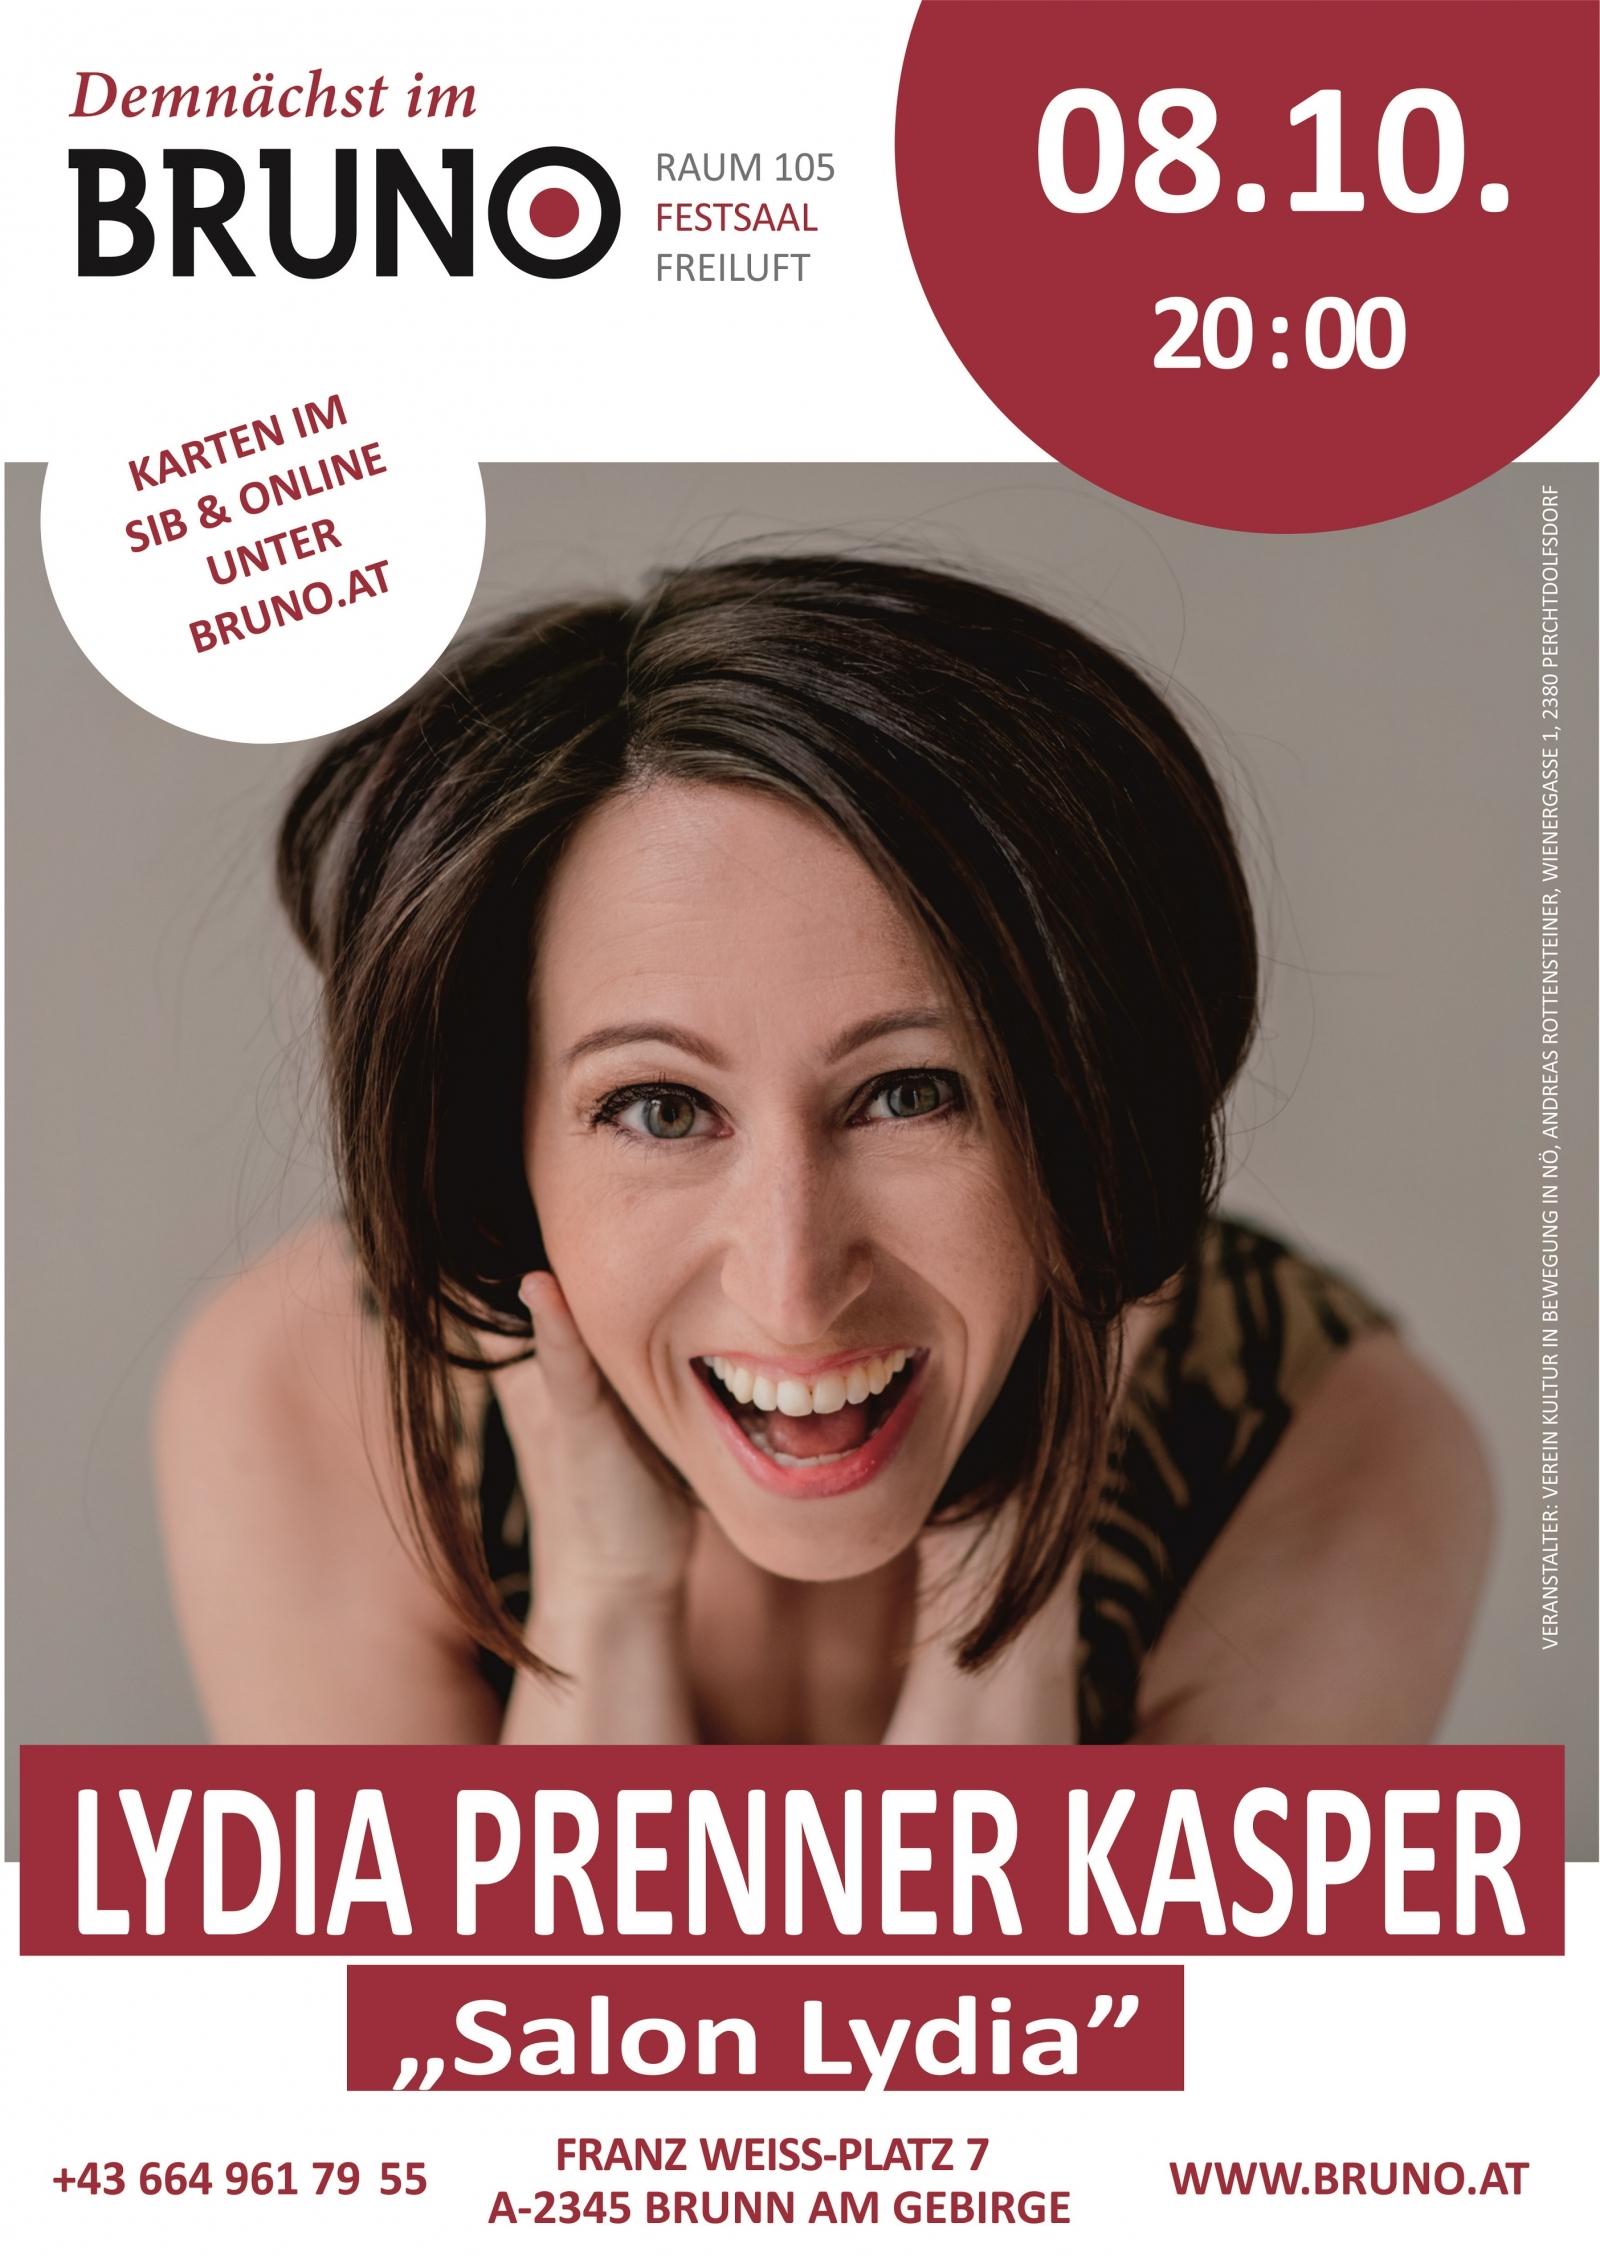 Lydia Prenner Kasper Salon Lydia